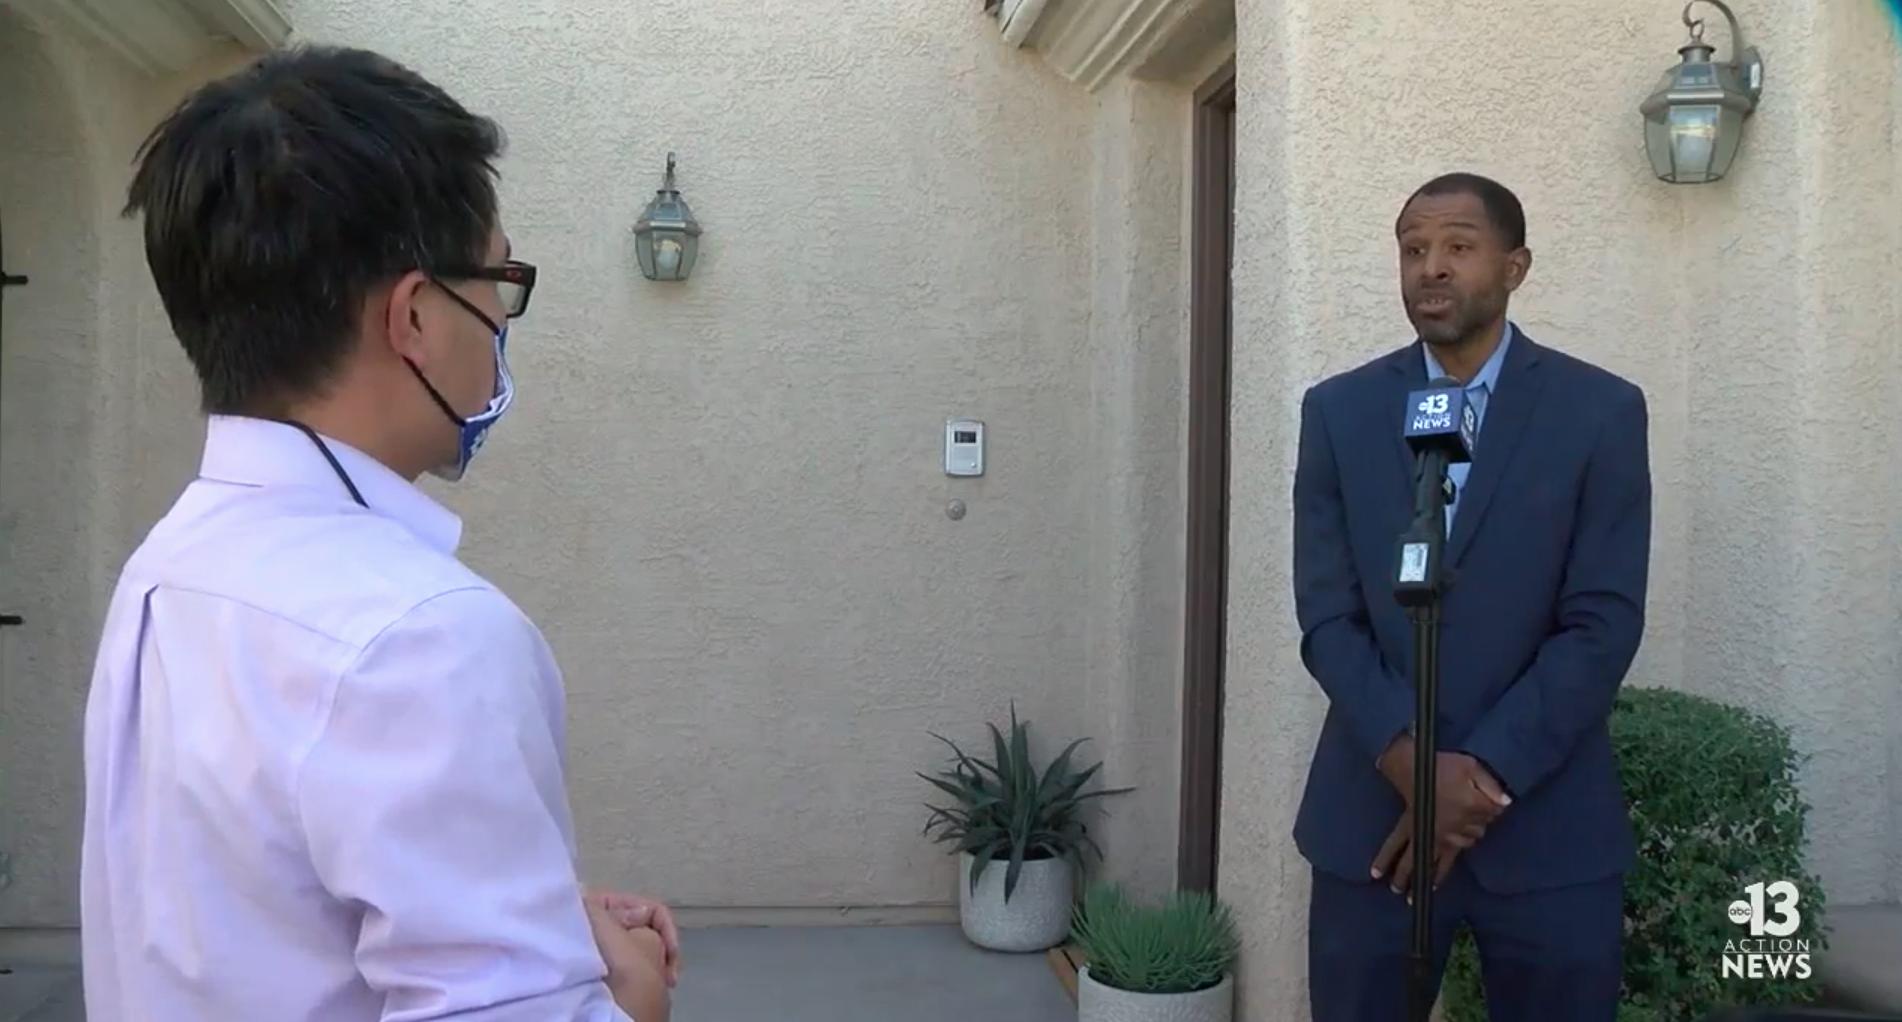 Vegas-area therapist raising alarms on student mental health - Dr. Sheldon Jacobs